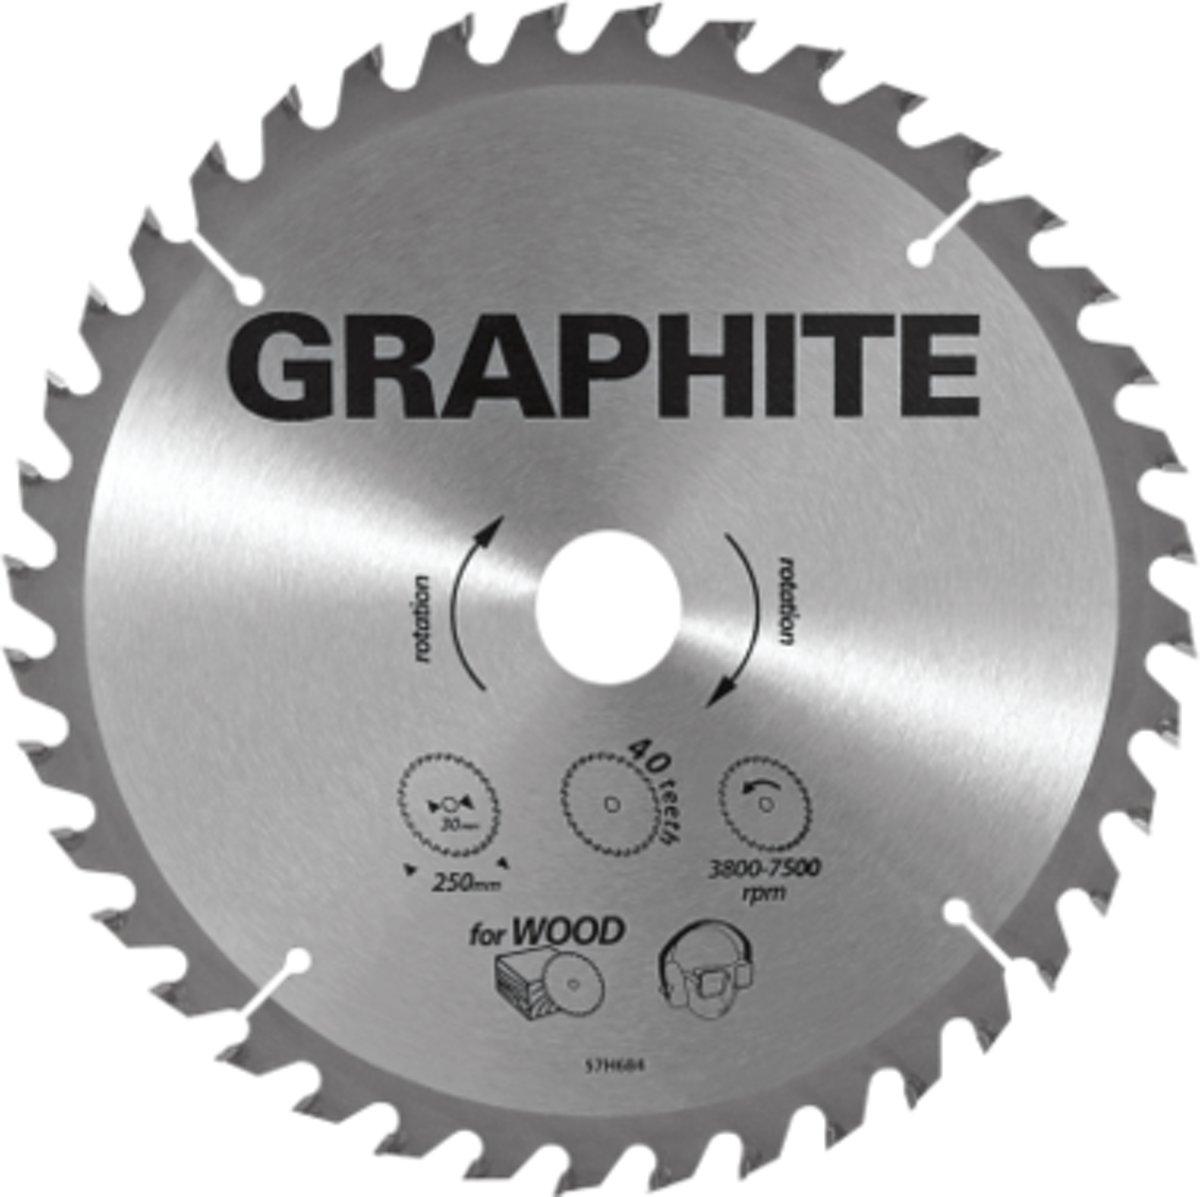 GRAPHITE Cirkelzaagblad 250 mm, 100 tands, Aluminium